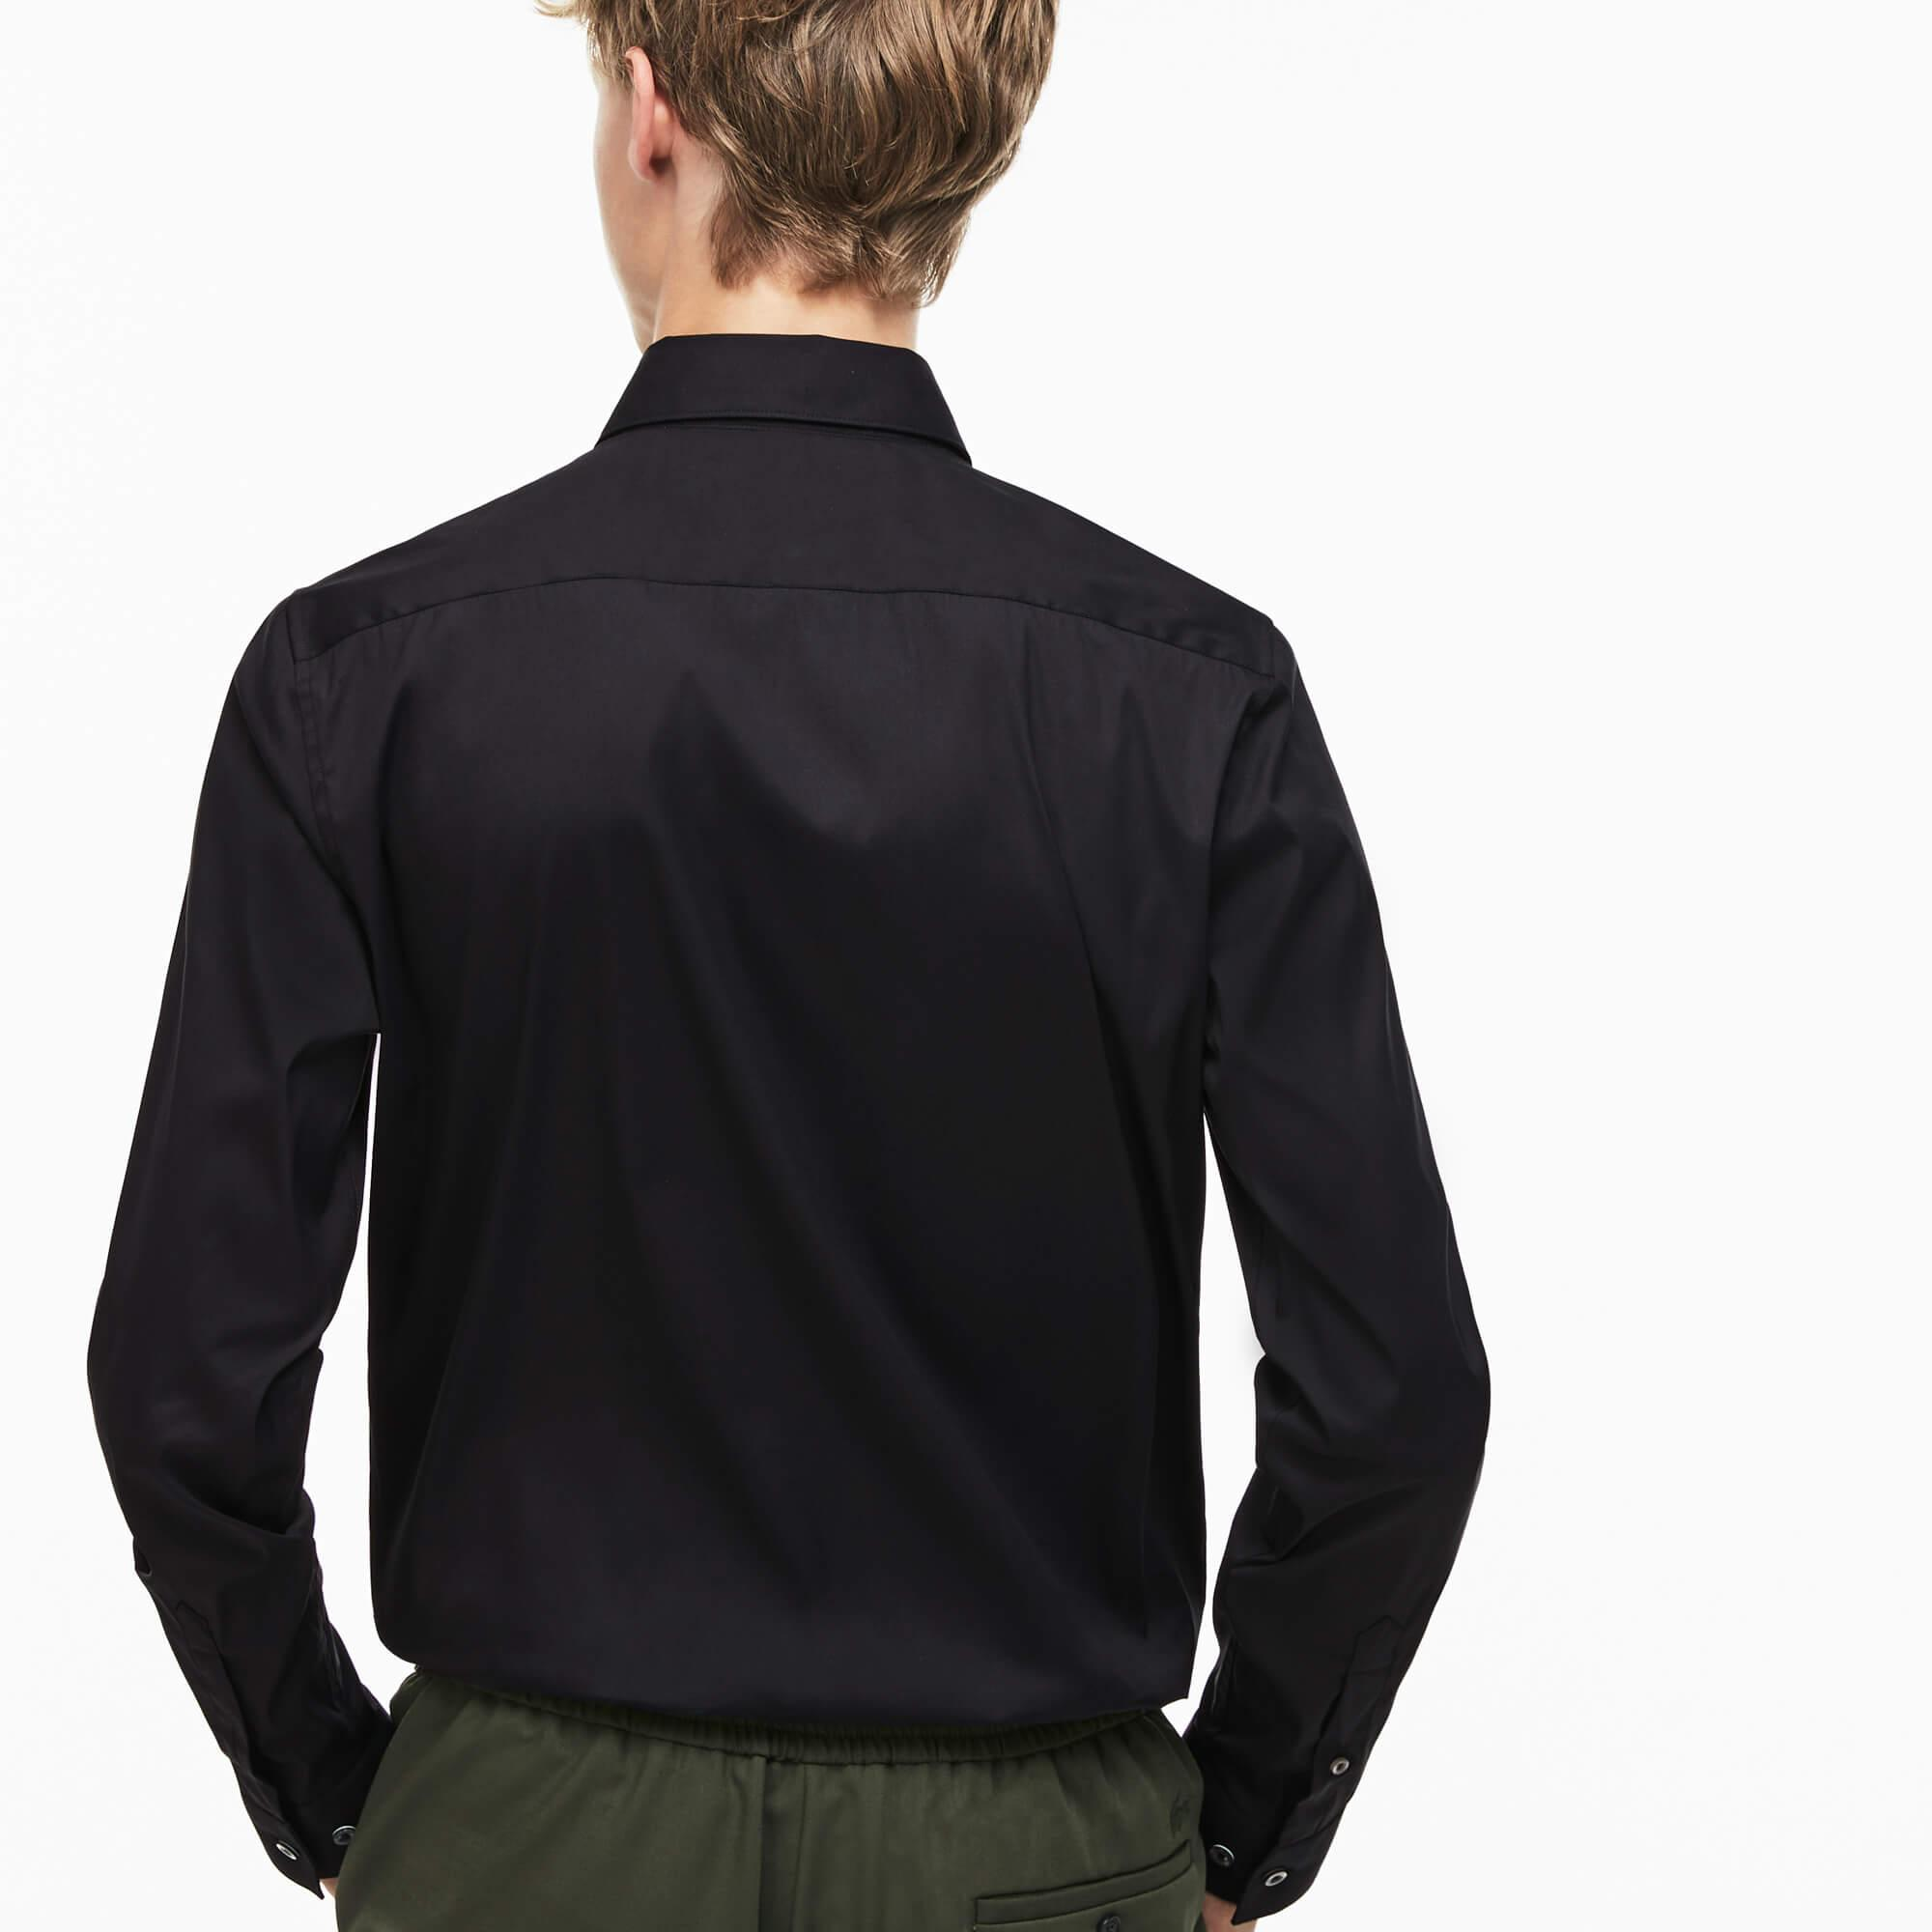 Lacoste Erkek Slim Fit Streç Poplin Pamuklu Siyah Gömlek